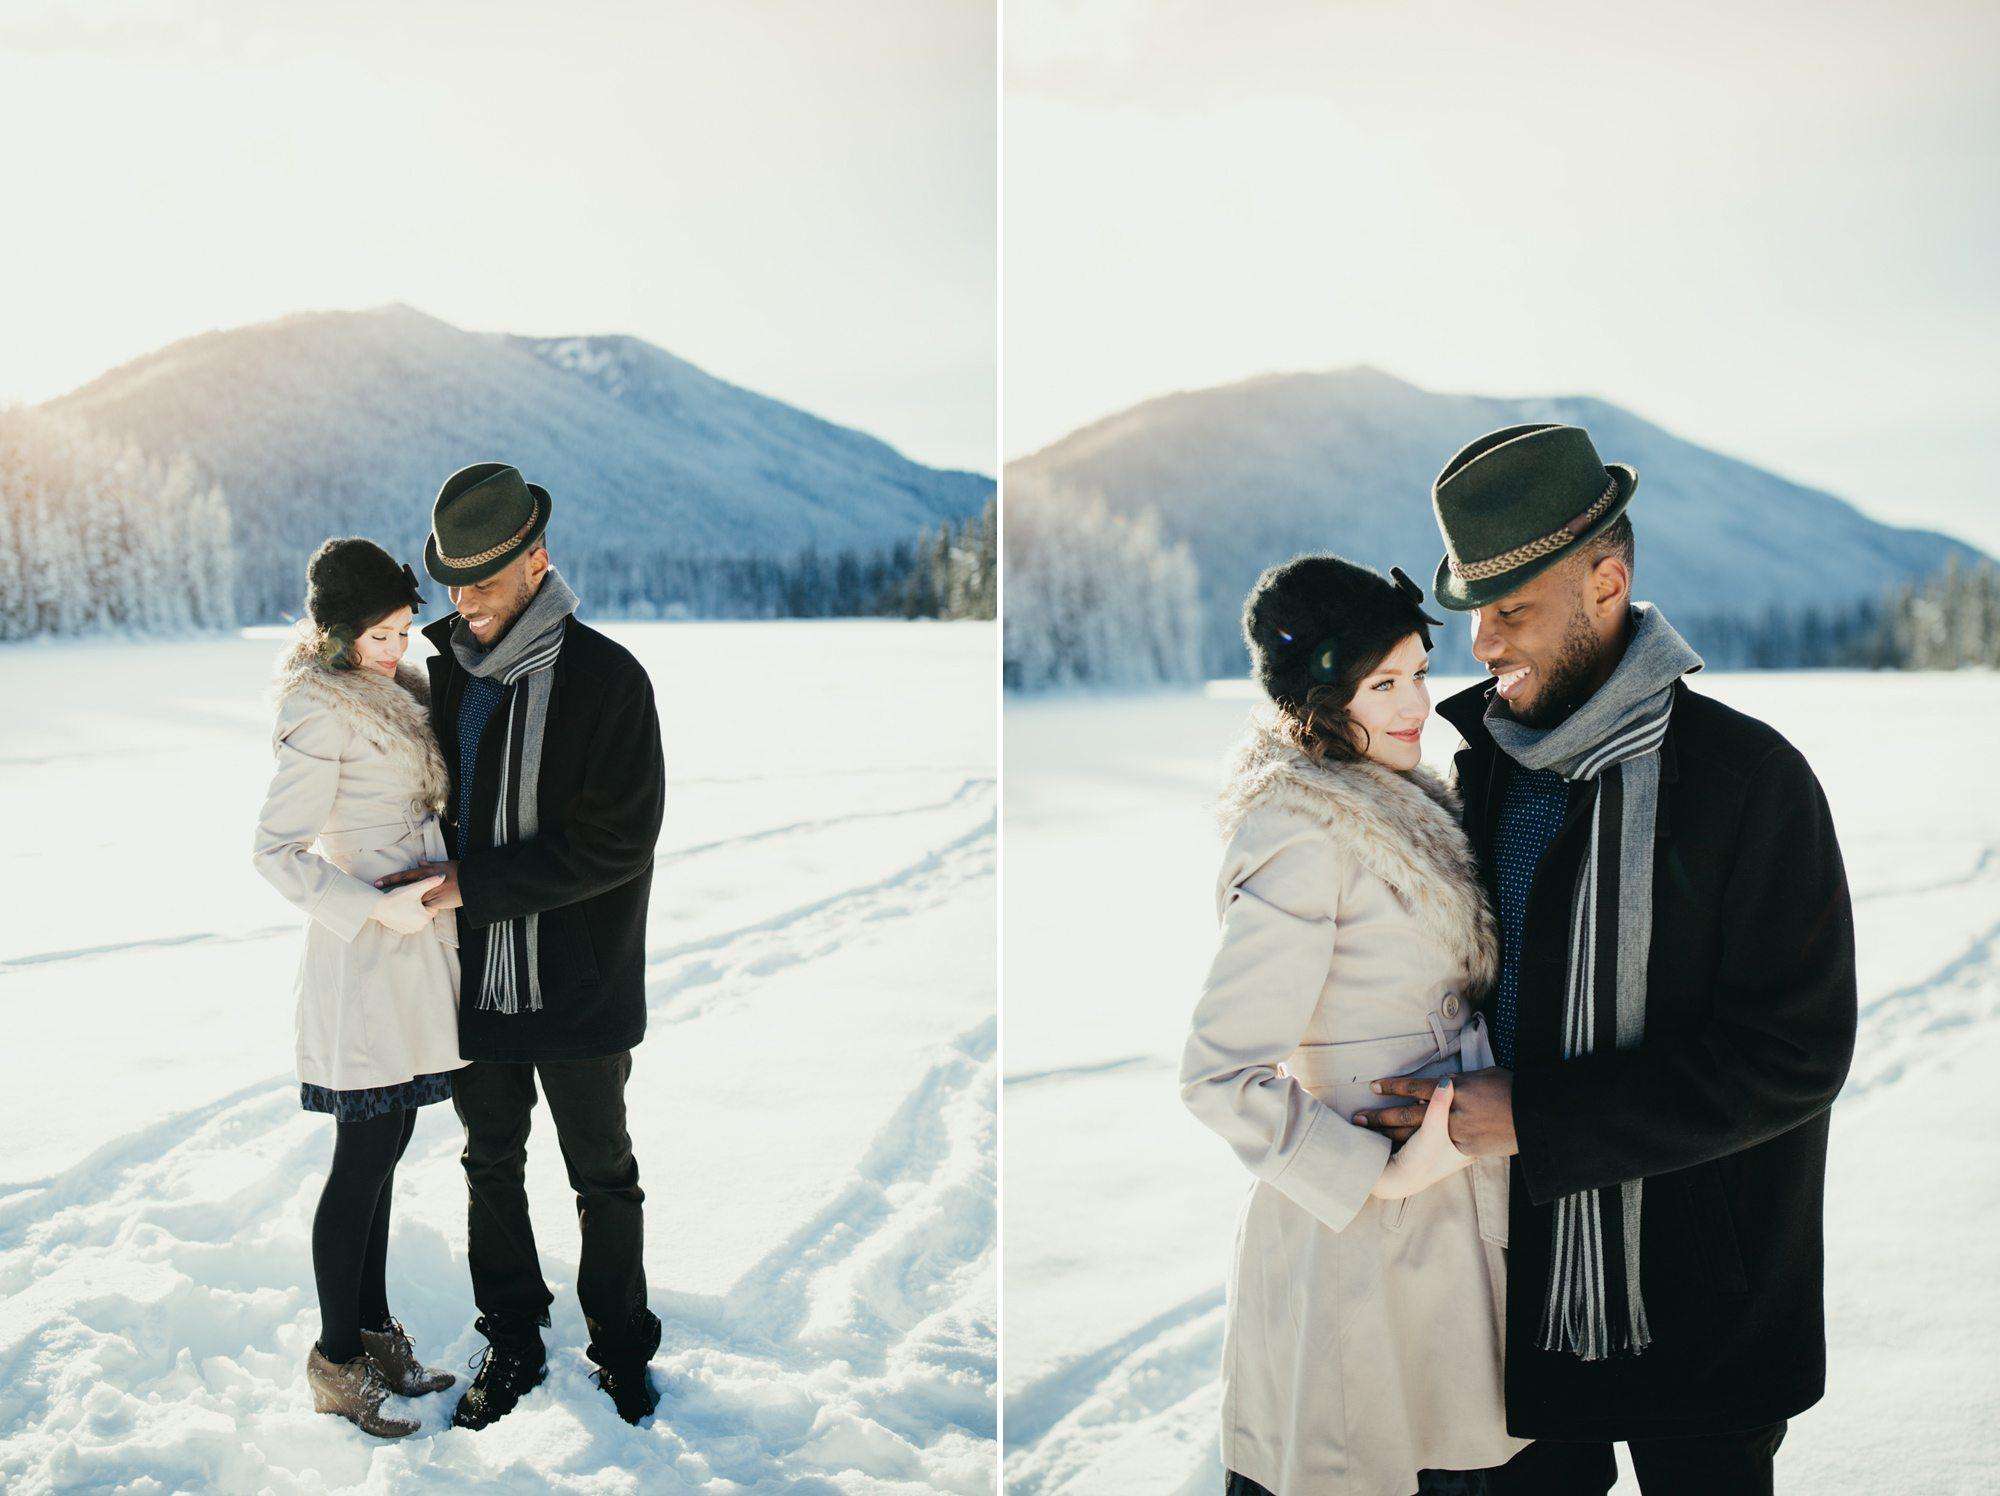 013-adventure-engagement-photographer